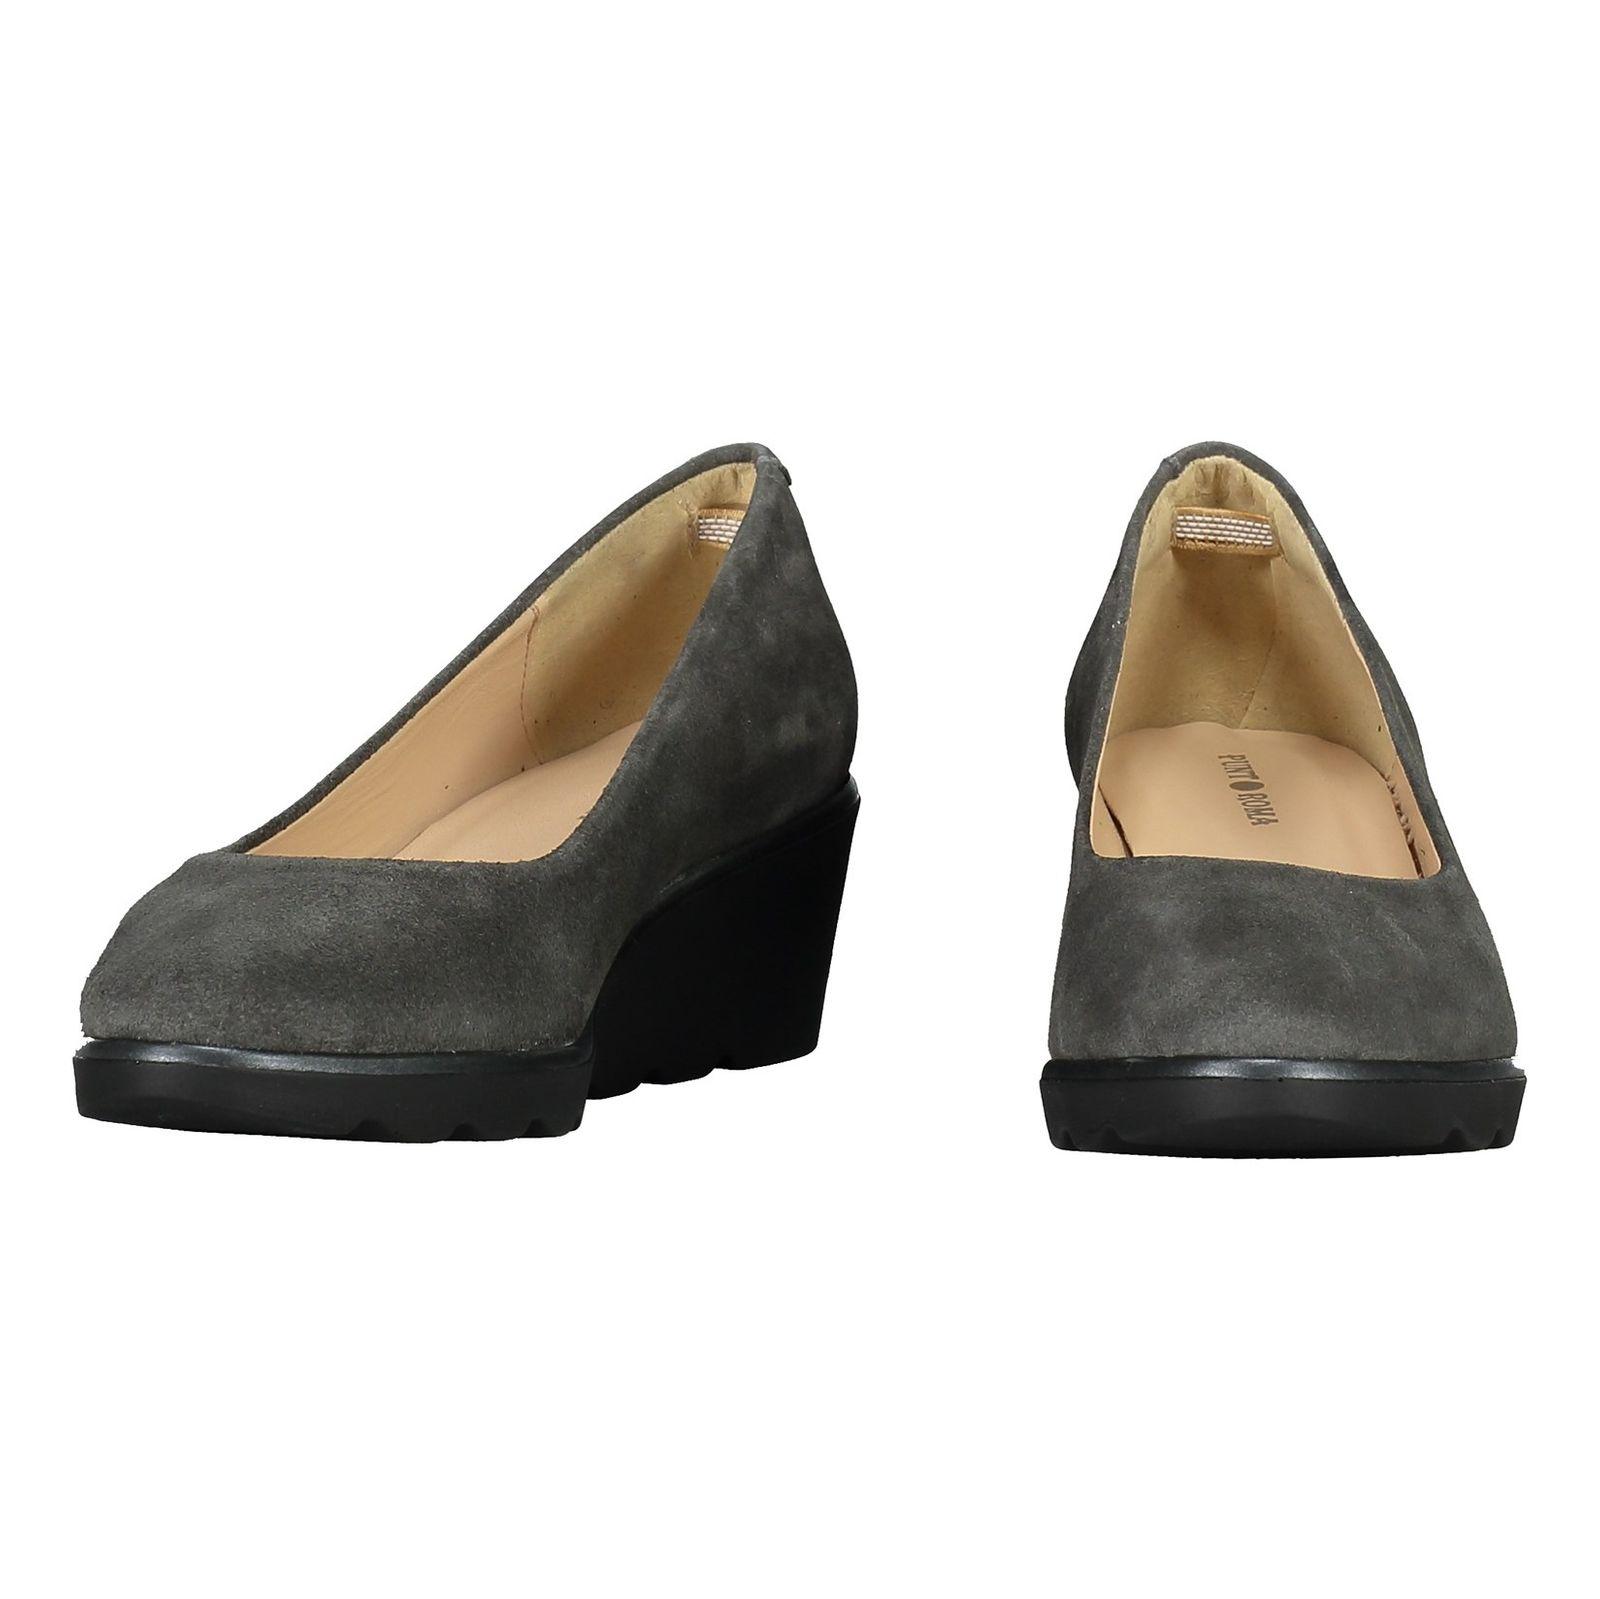 کفش جیر لژ دار چرم زنانه - پونت روما - طوسي - 4